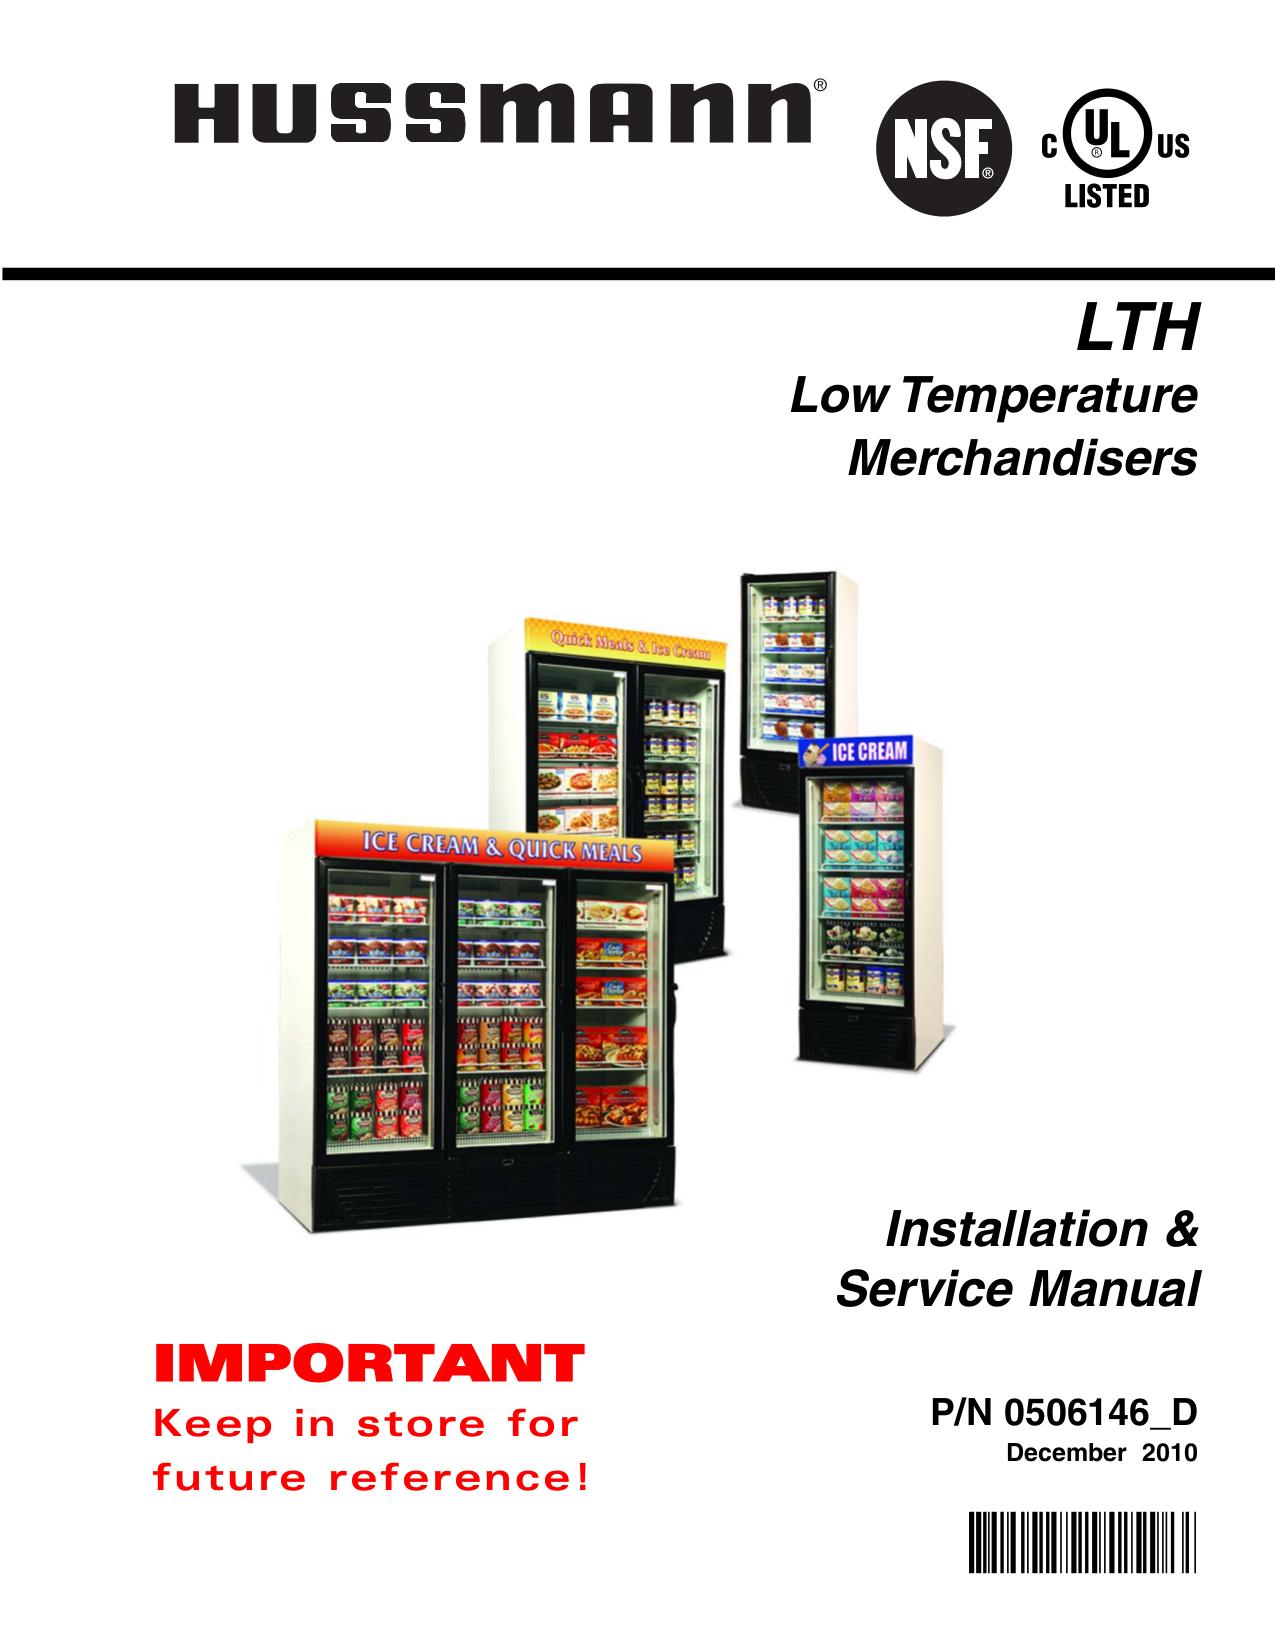 pdf for Hussmann Freezer ARV manual